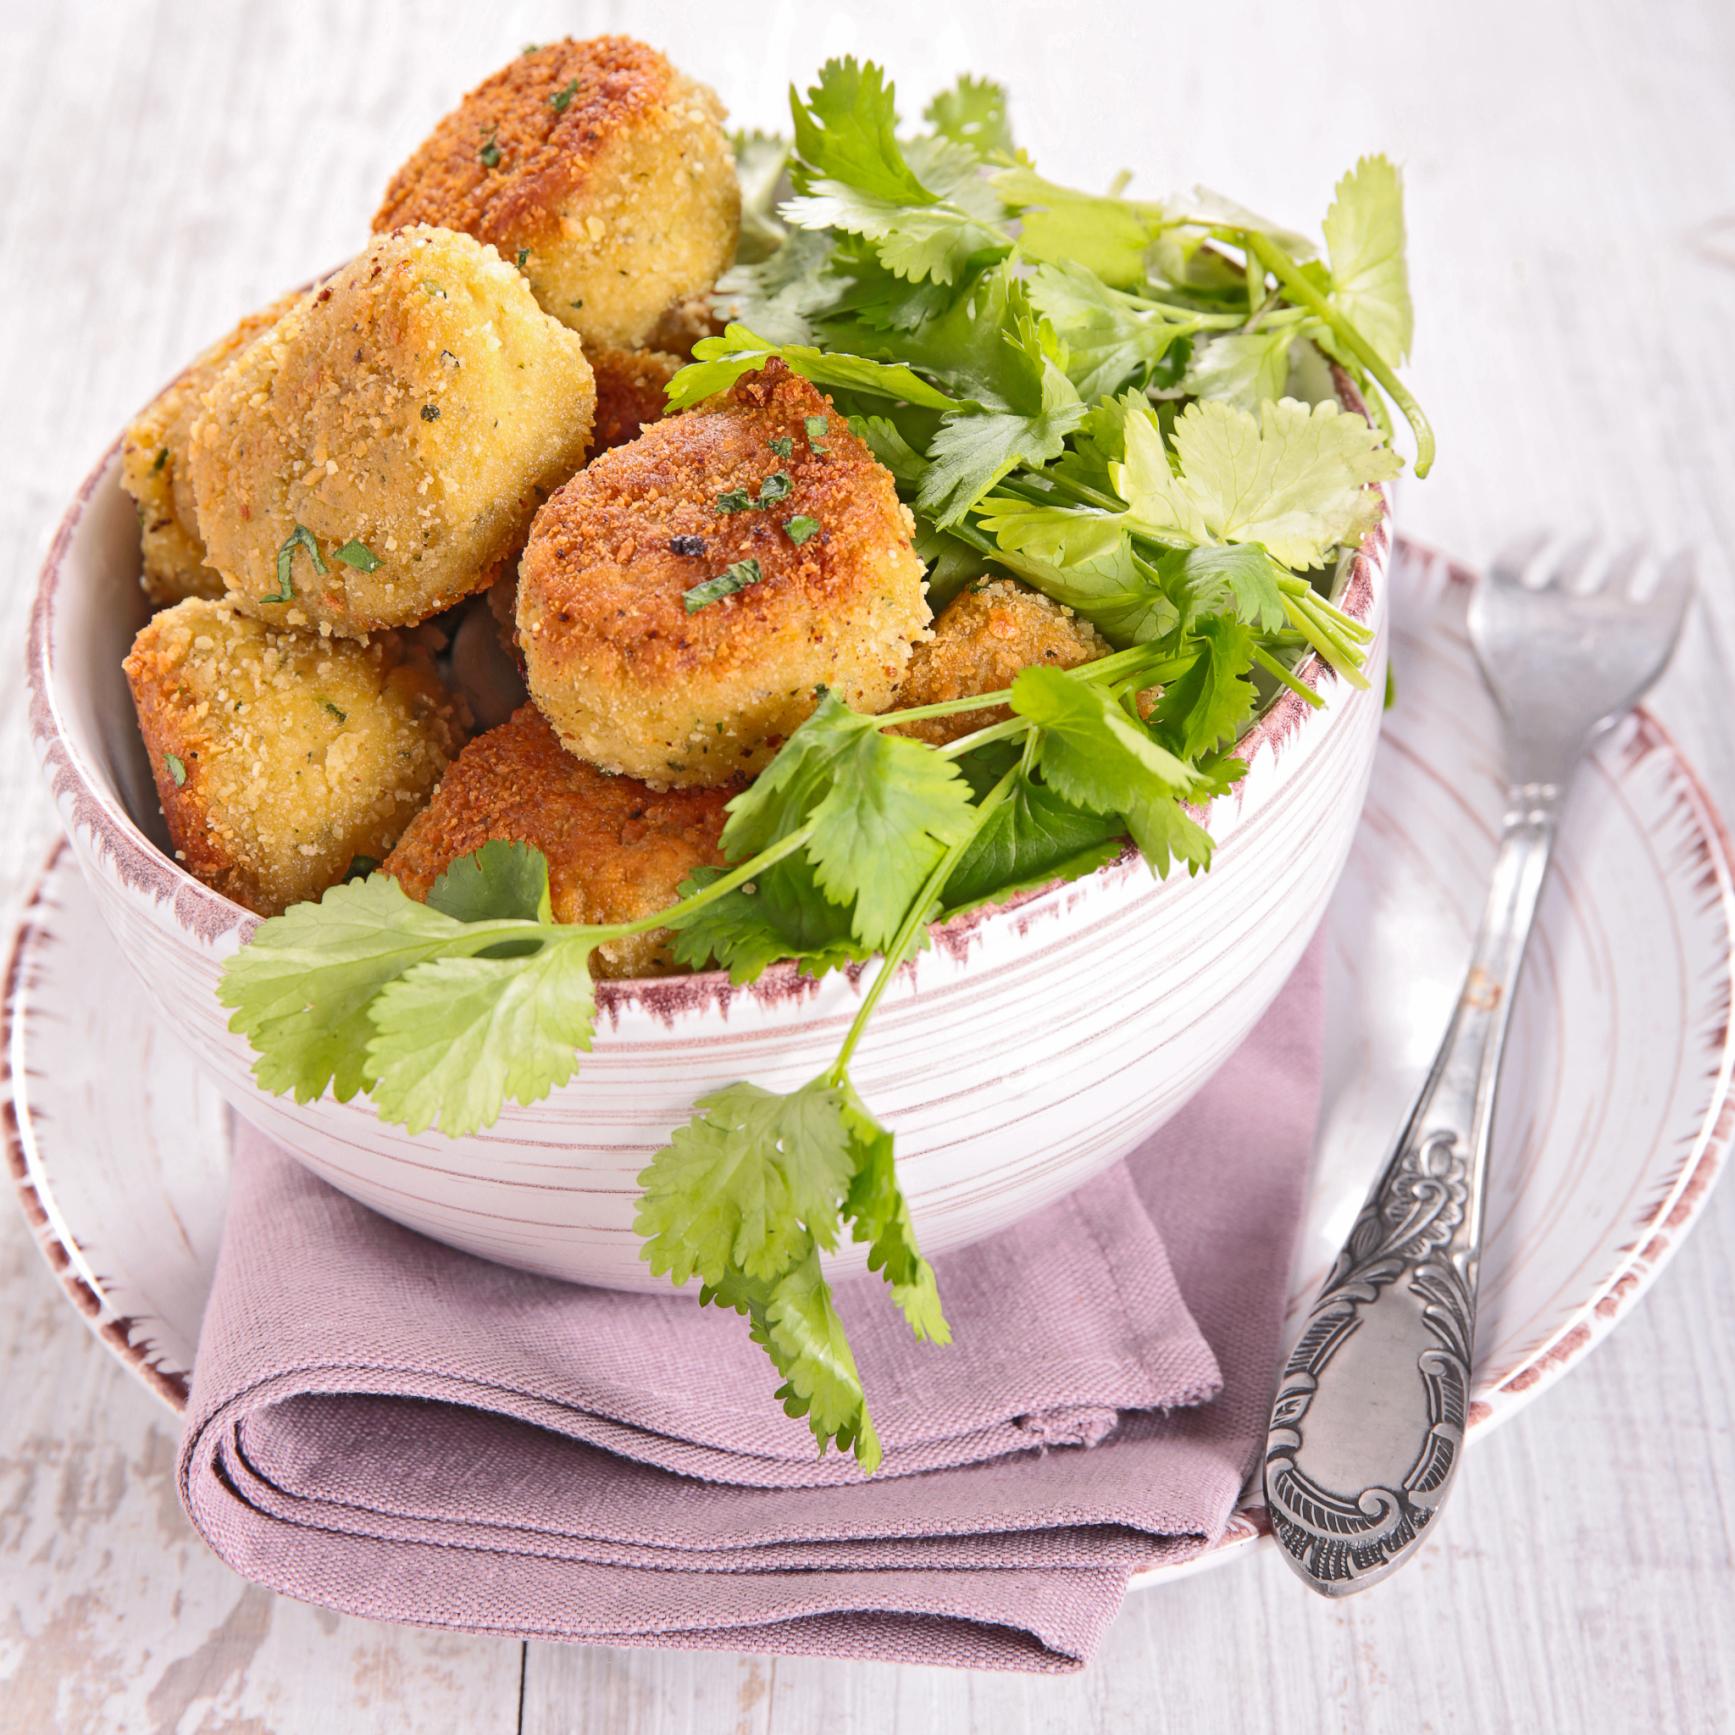 A nyár krumplija, a sokoldalú cukkini